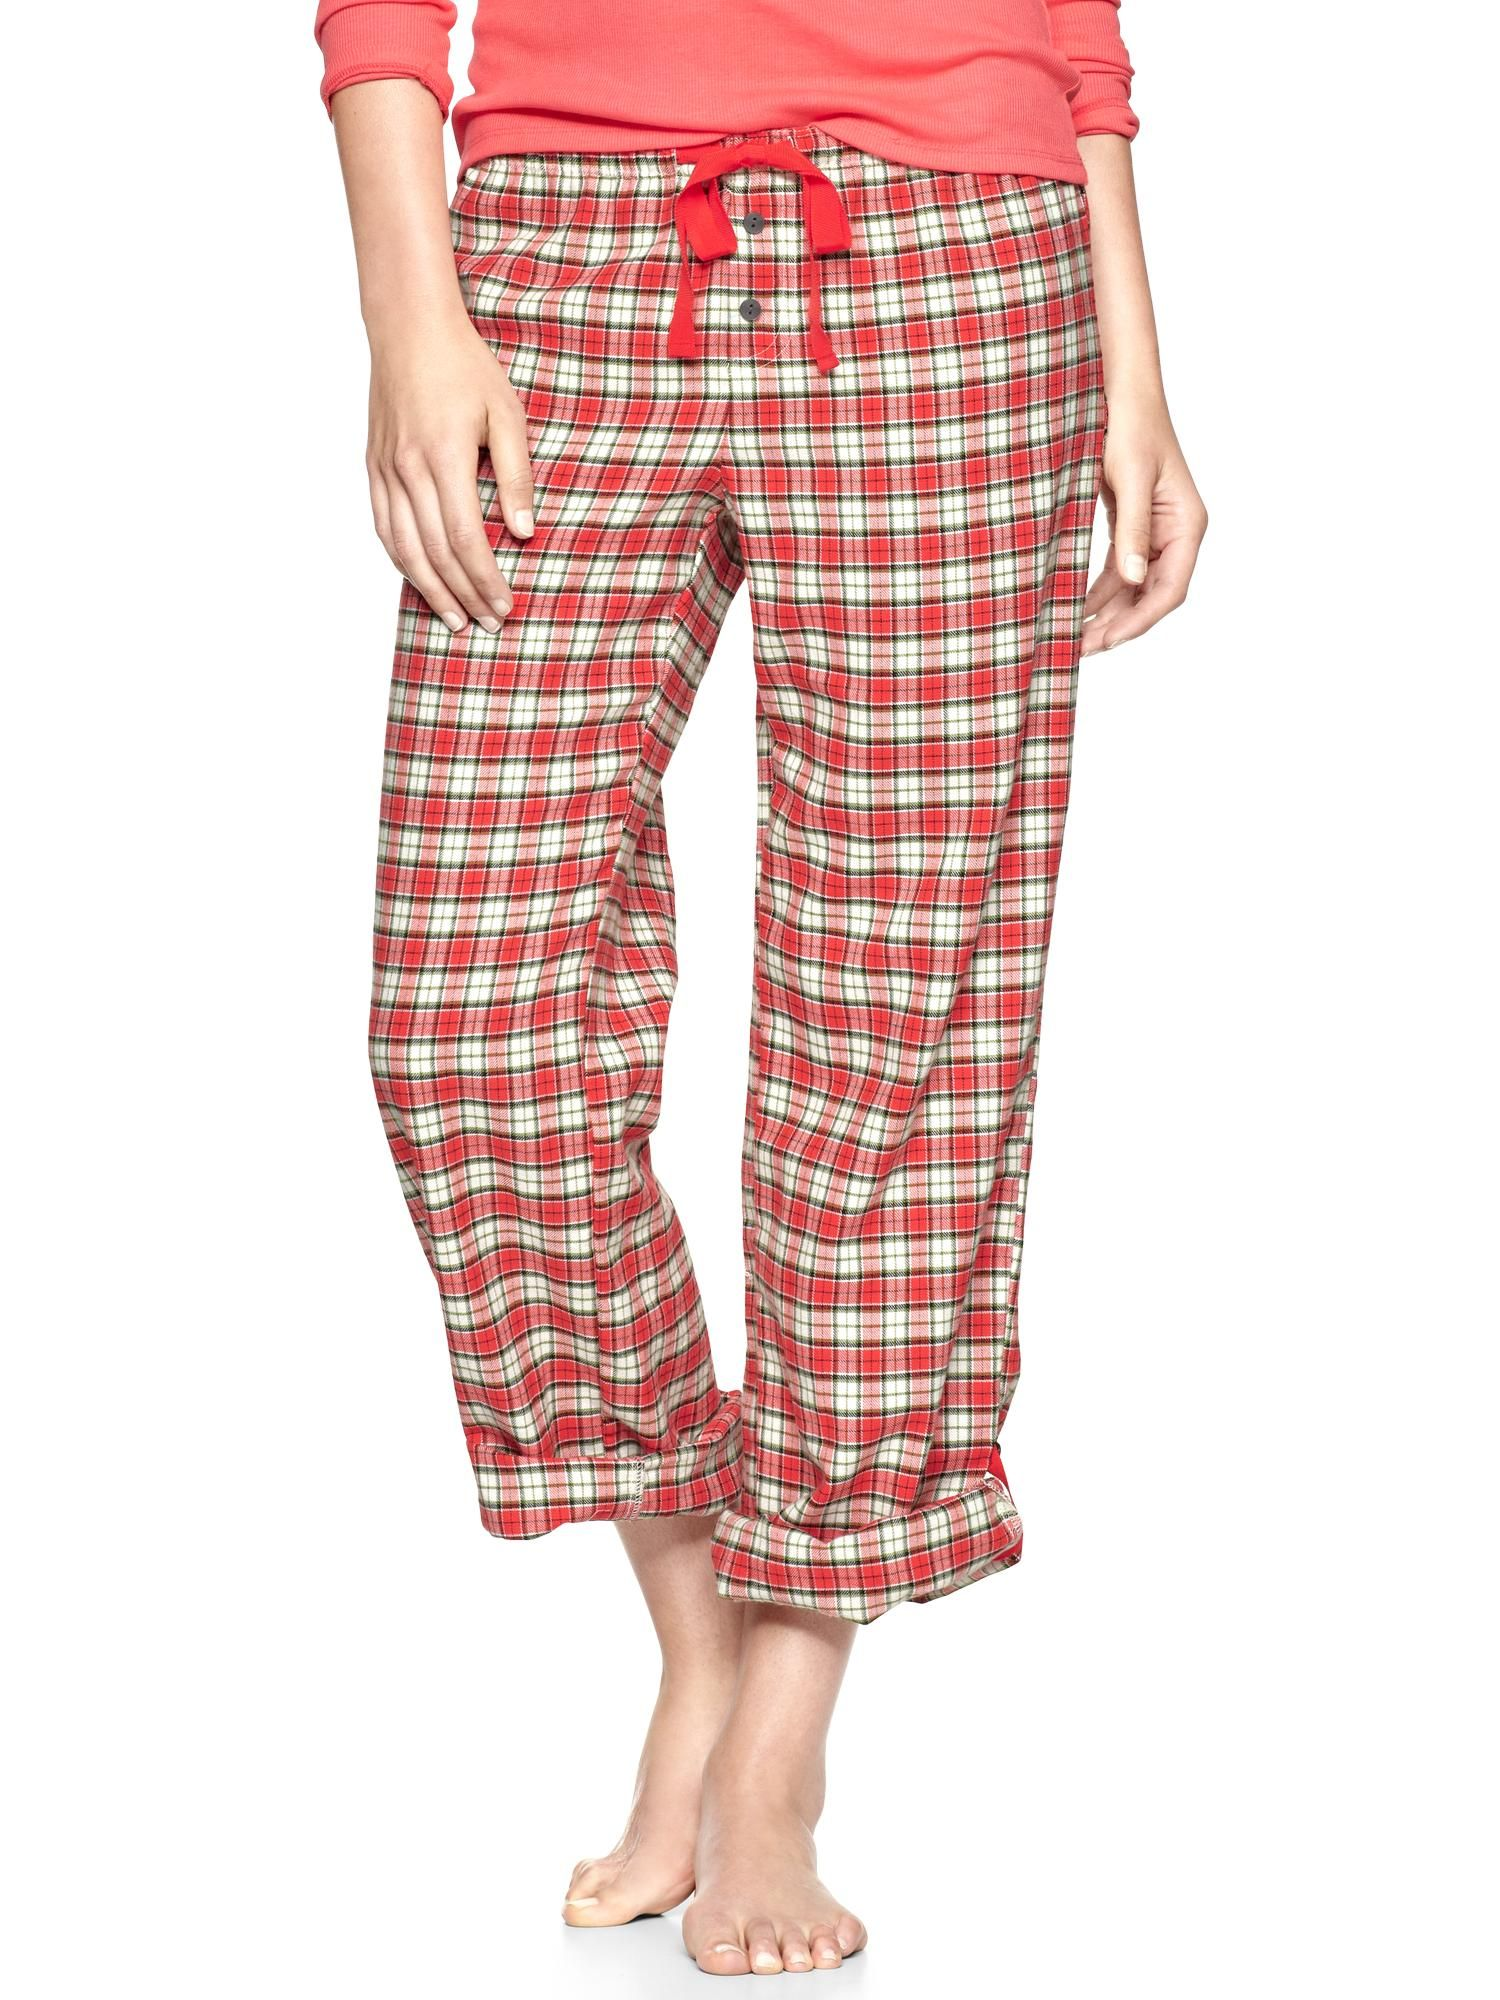 Red flannel pajamas  Flannel pijama altı  GAP  LADIES FASHON  Pinterest  Flannels and